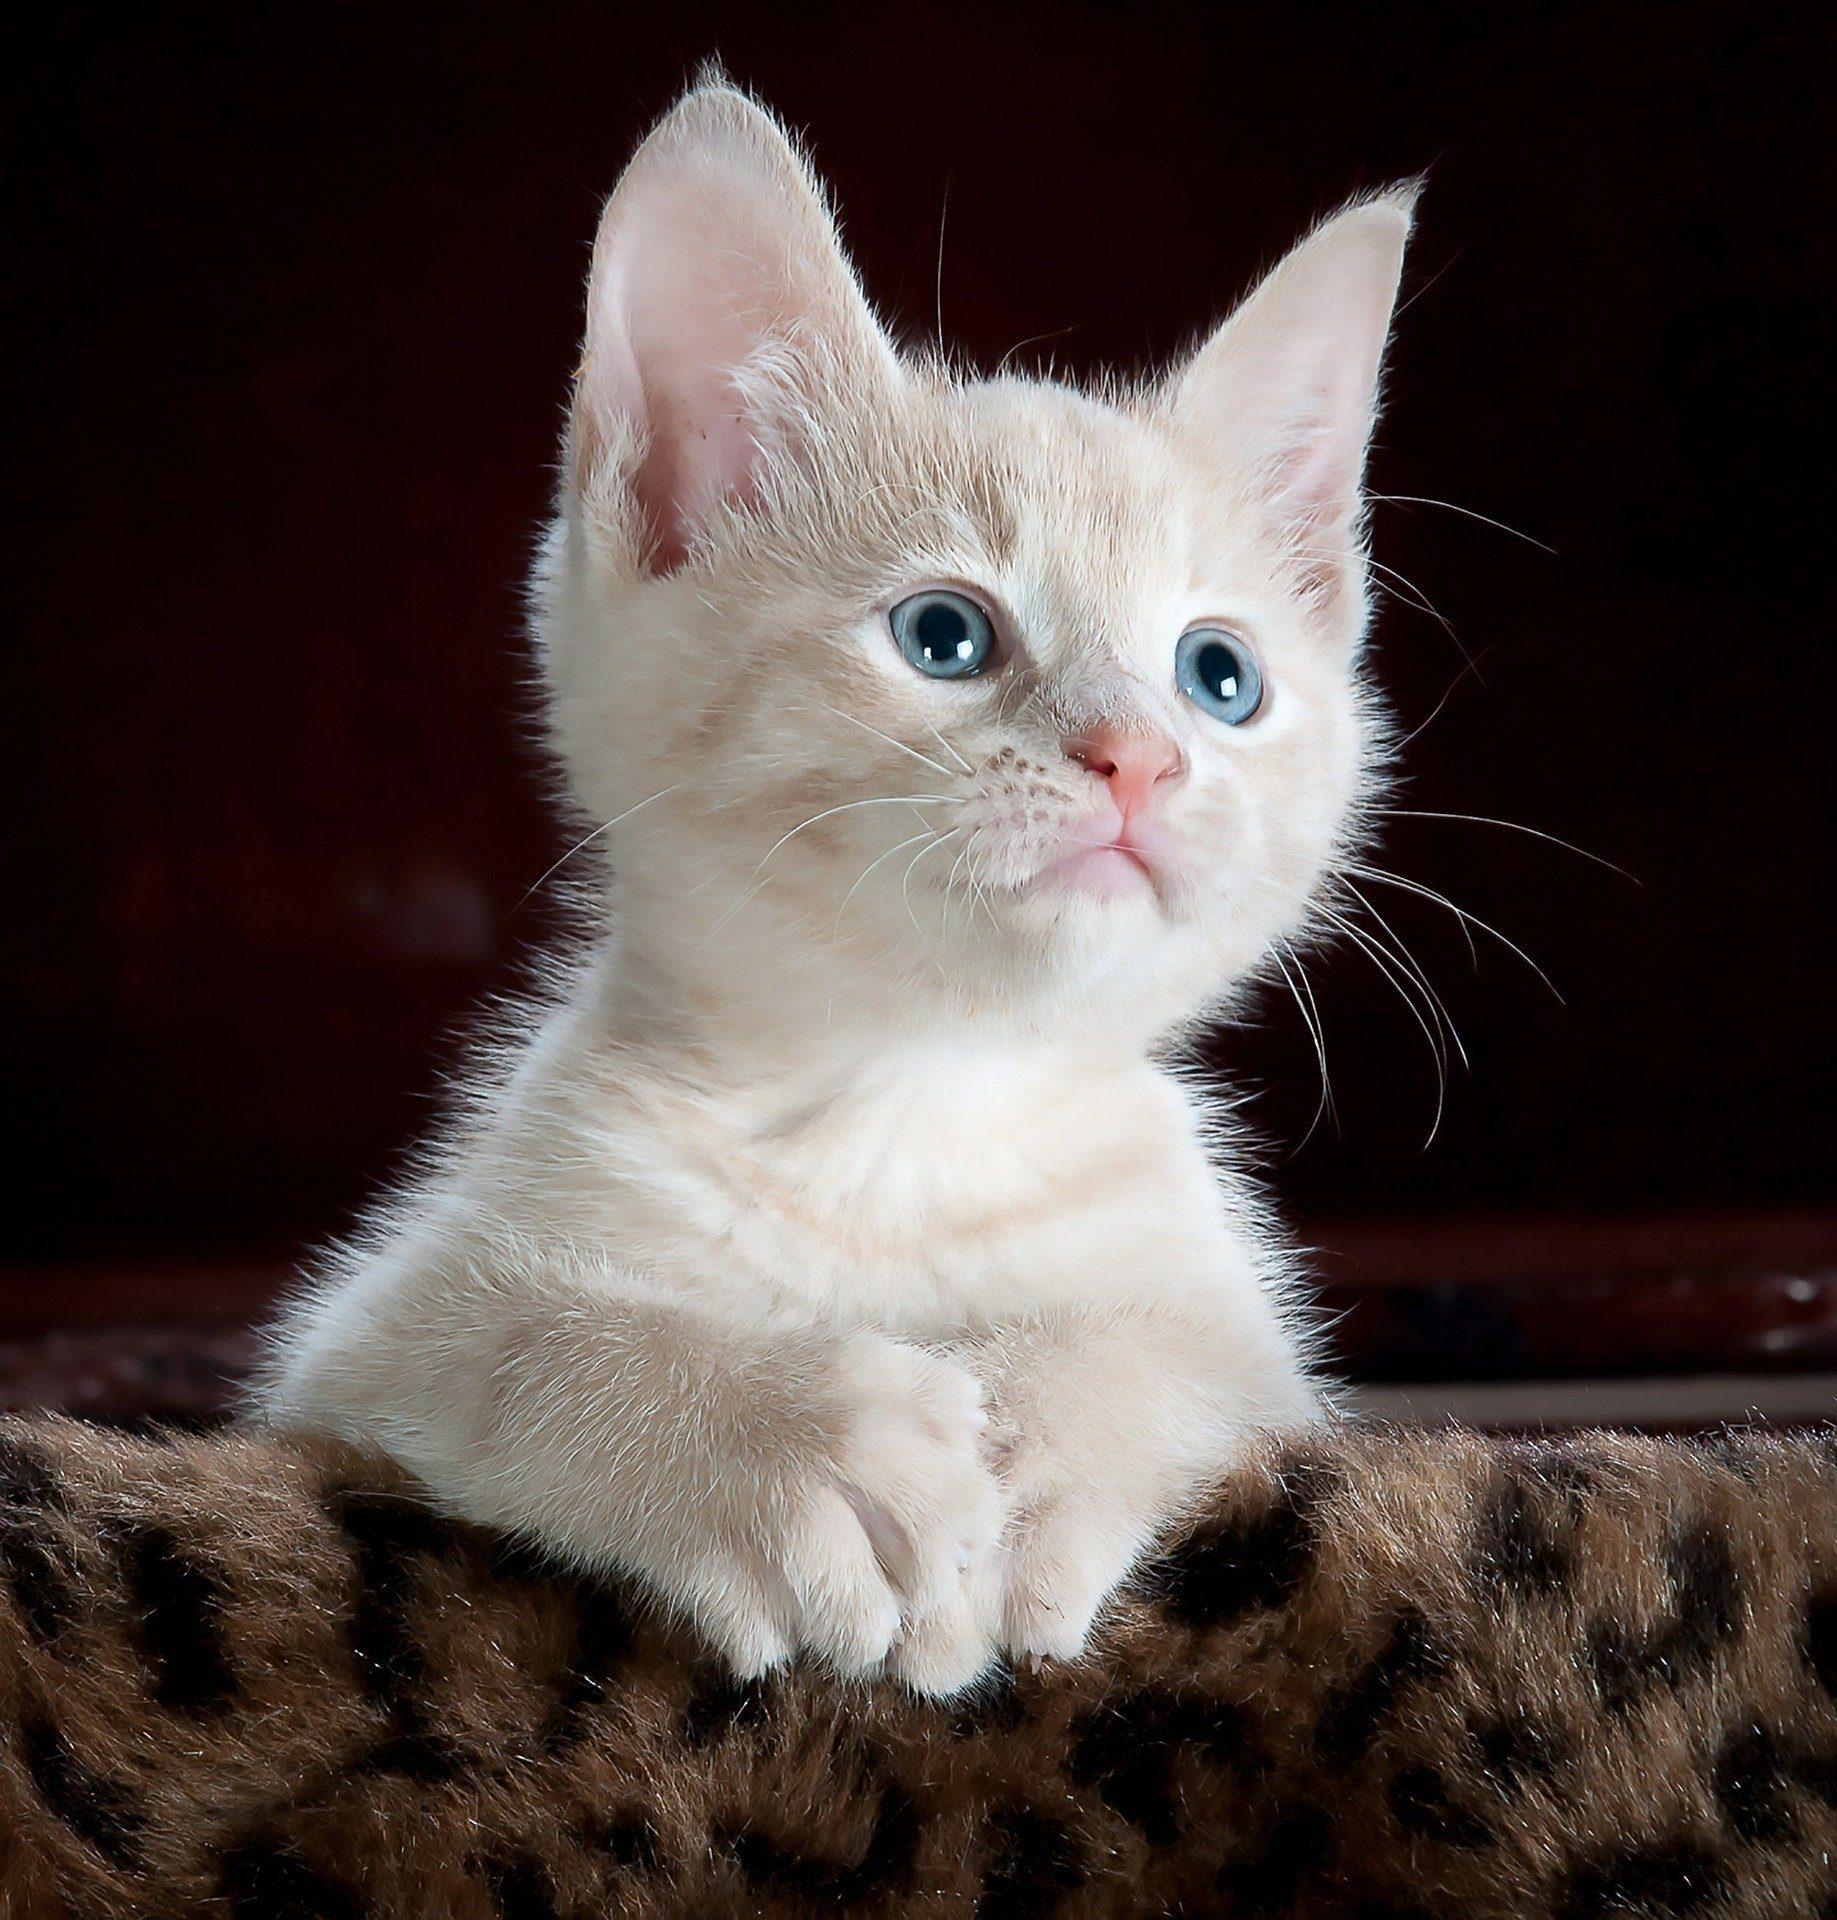 kitty-551554_1920.jpg